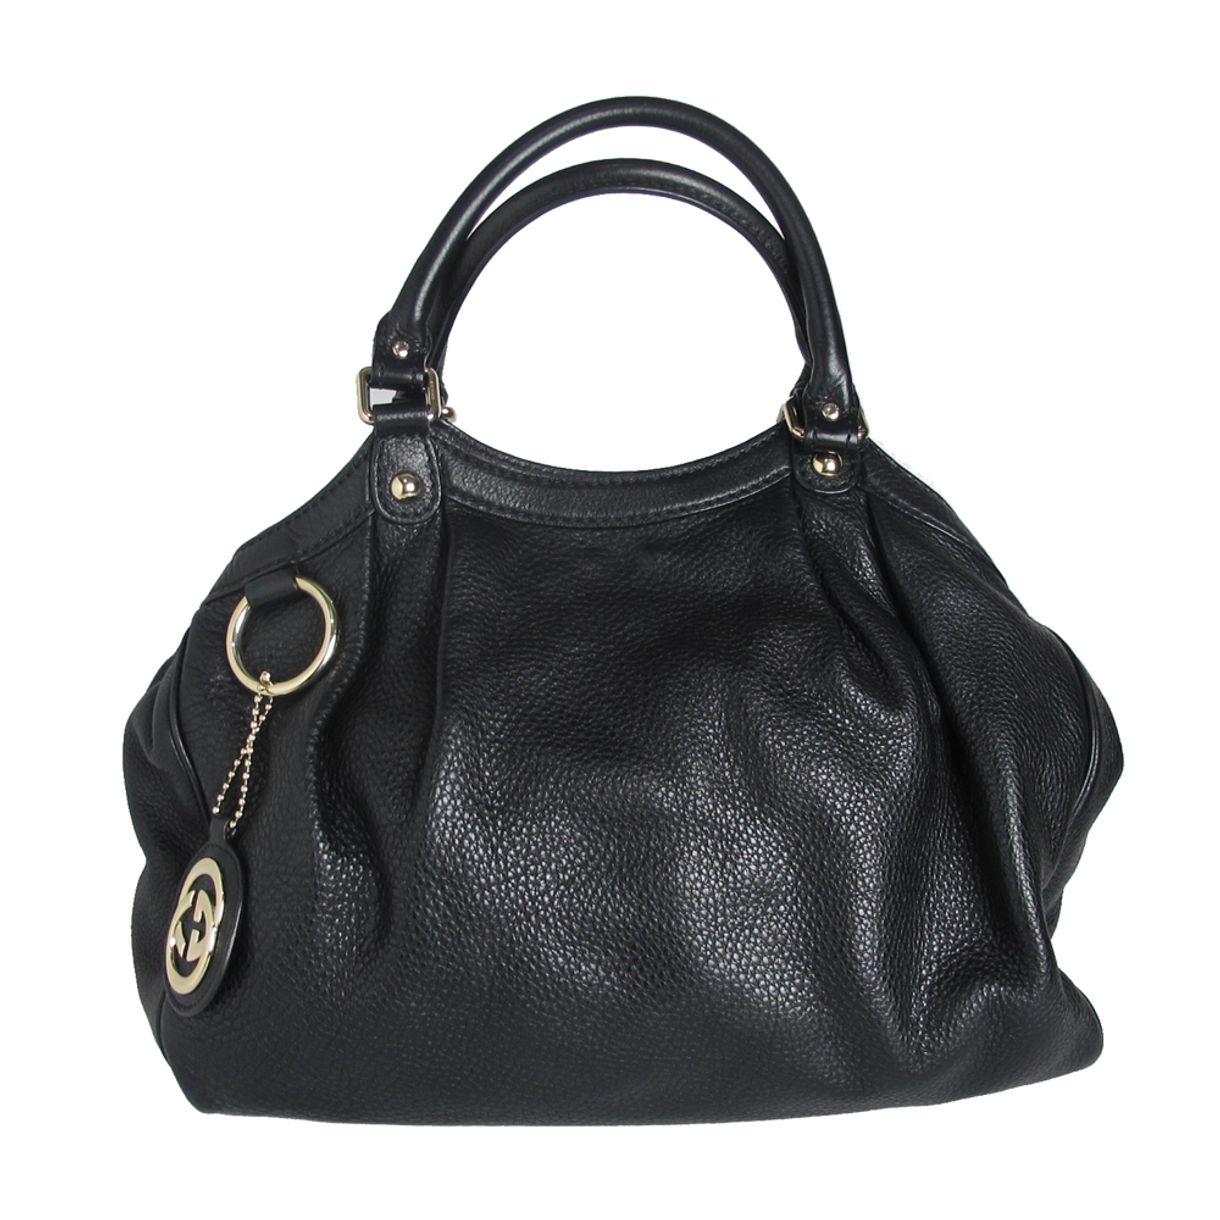 Bolsa-Gucci-Sukey-Leather-Medium